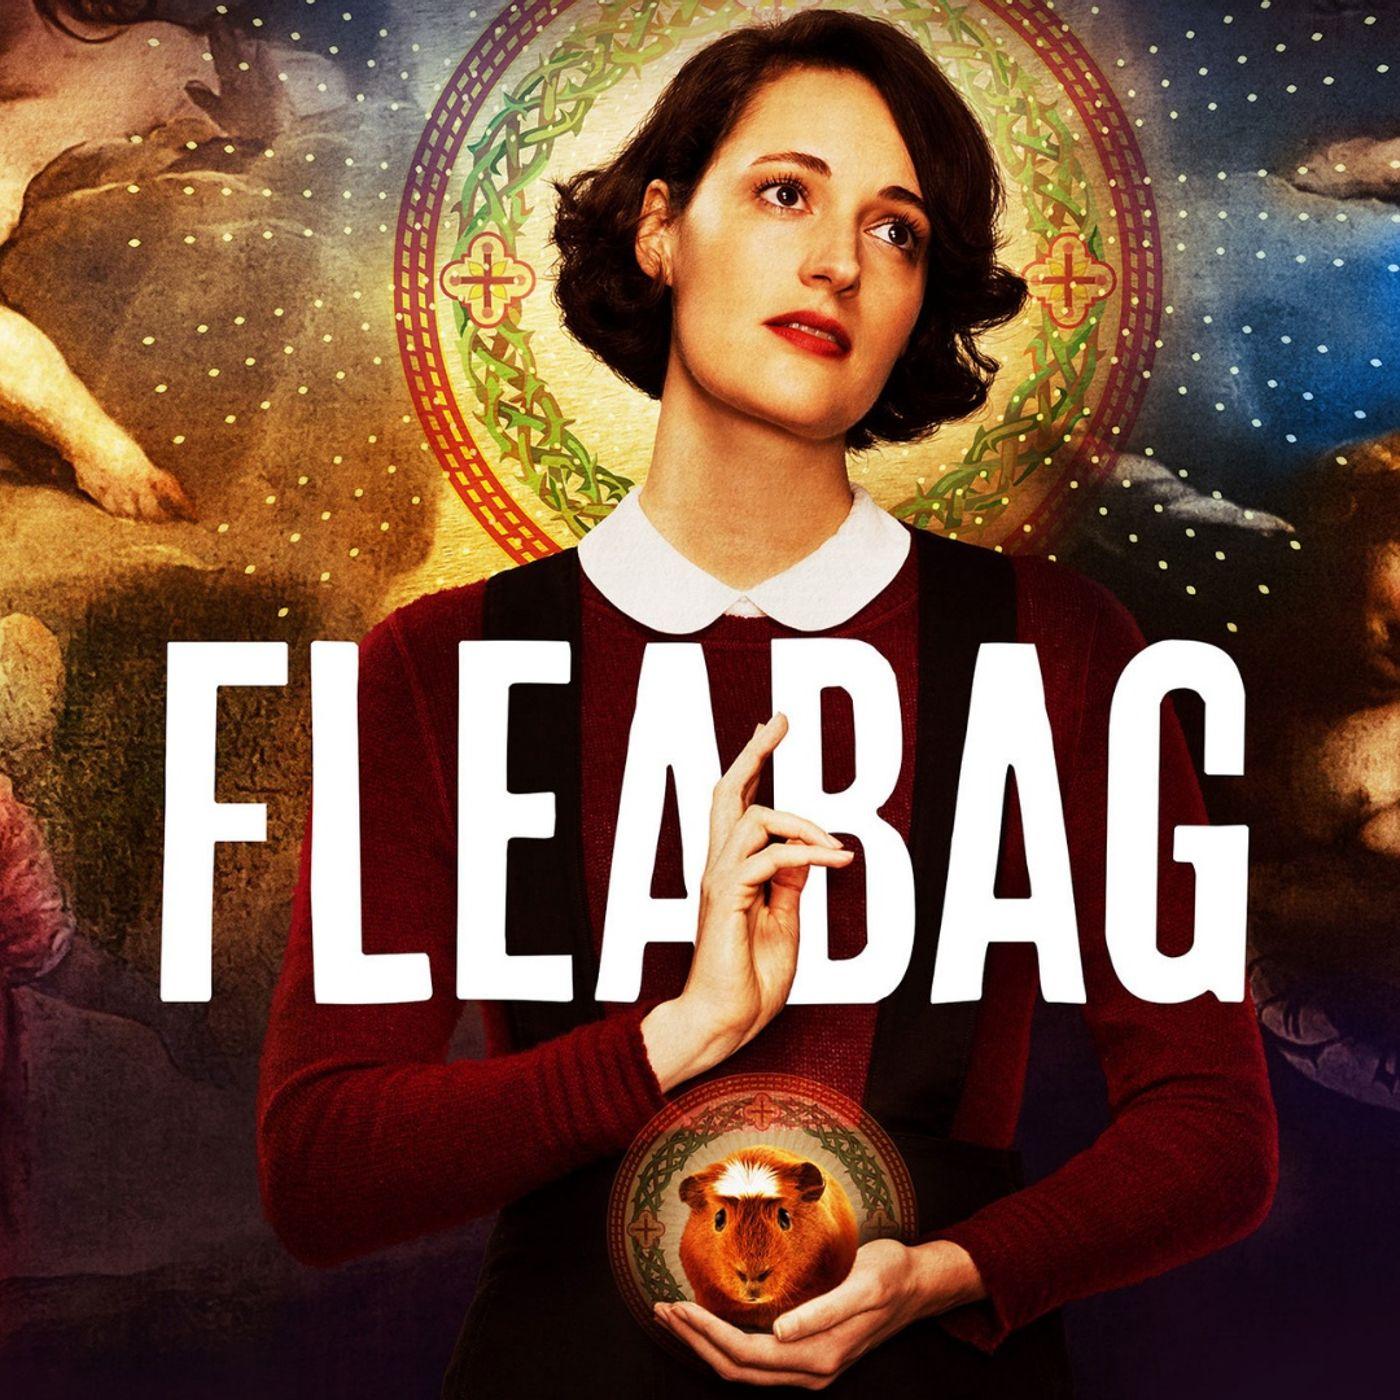 Fleabag, S02E05